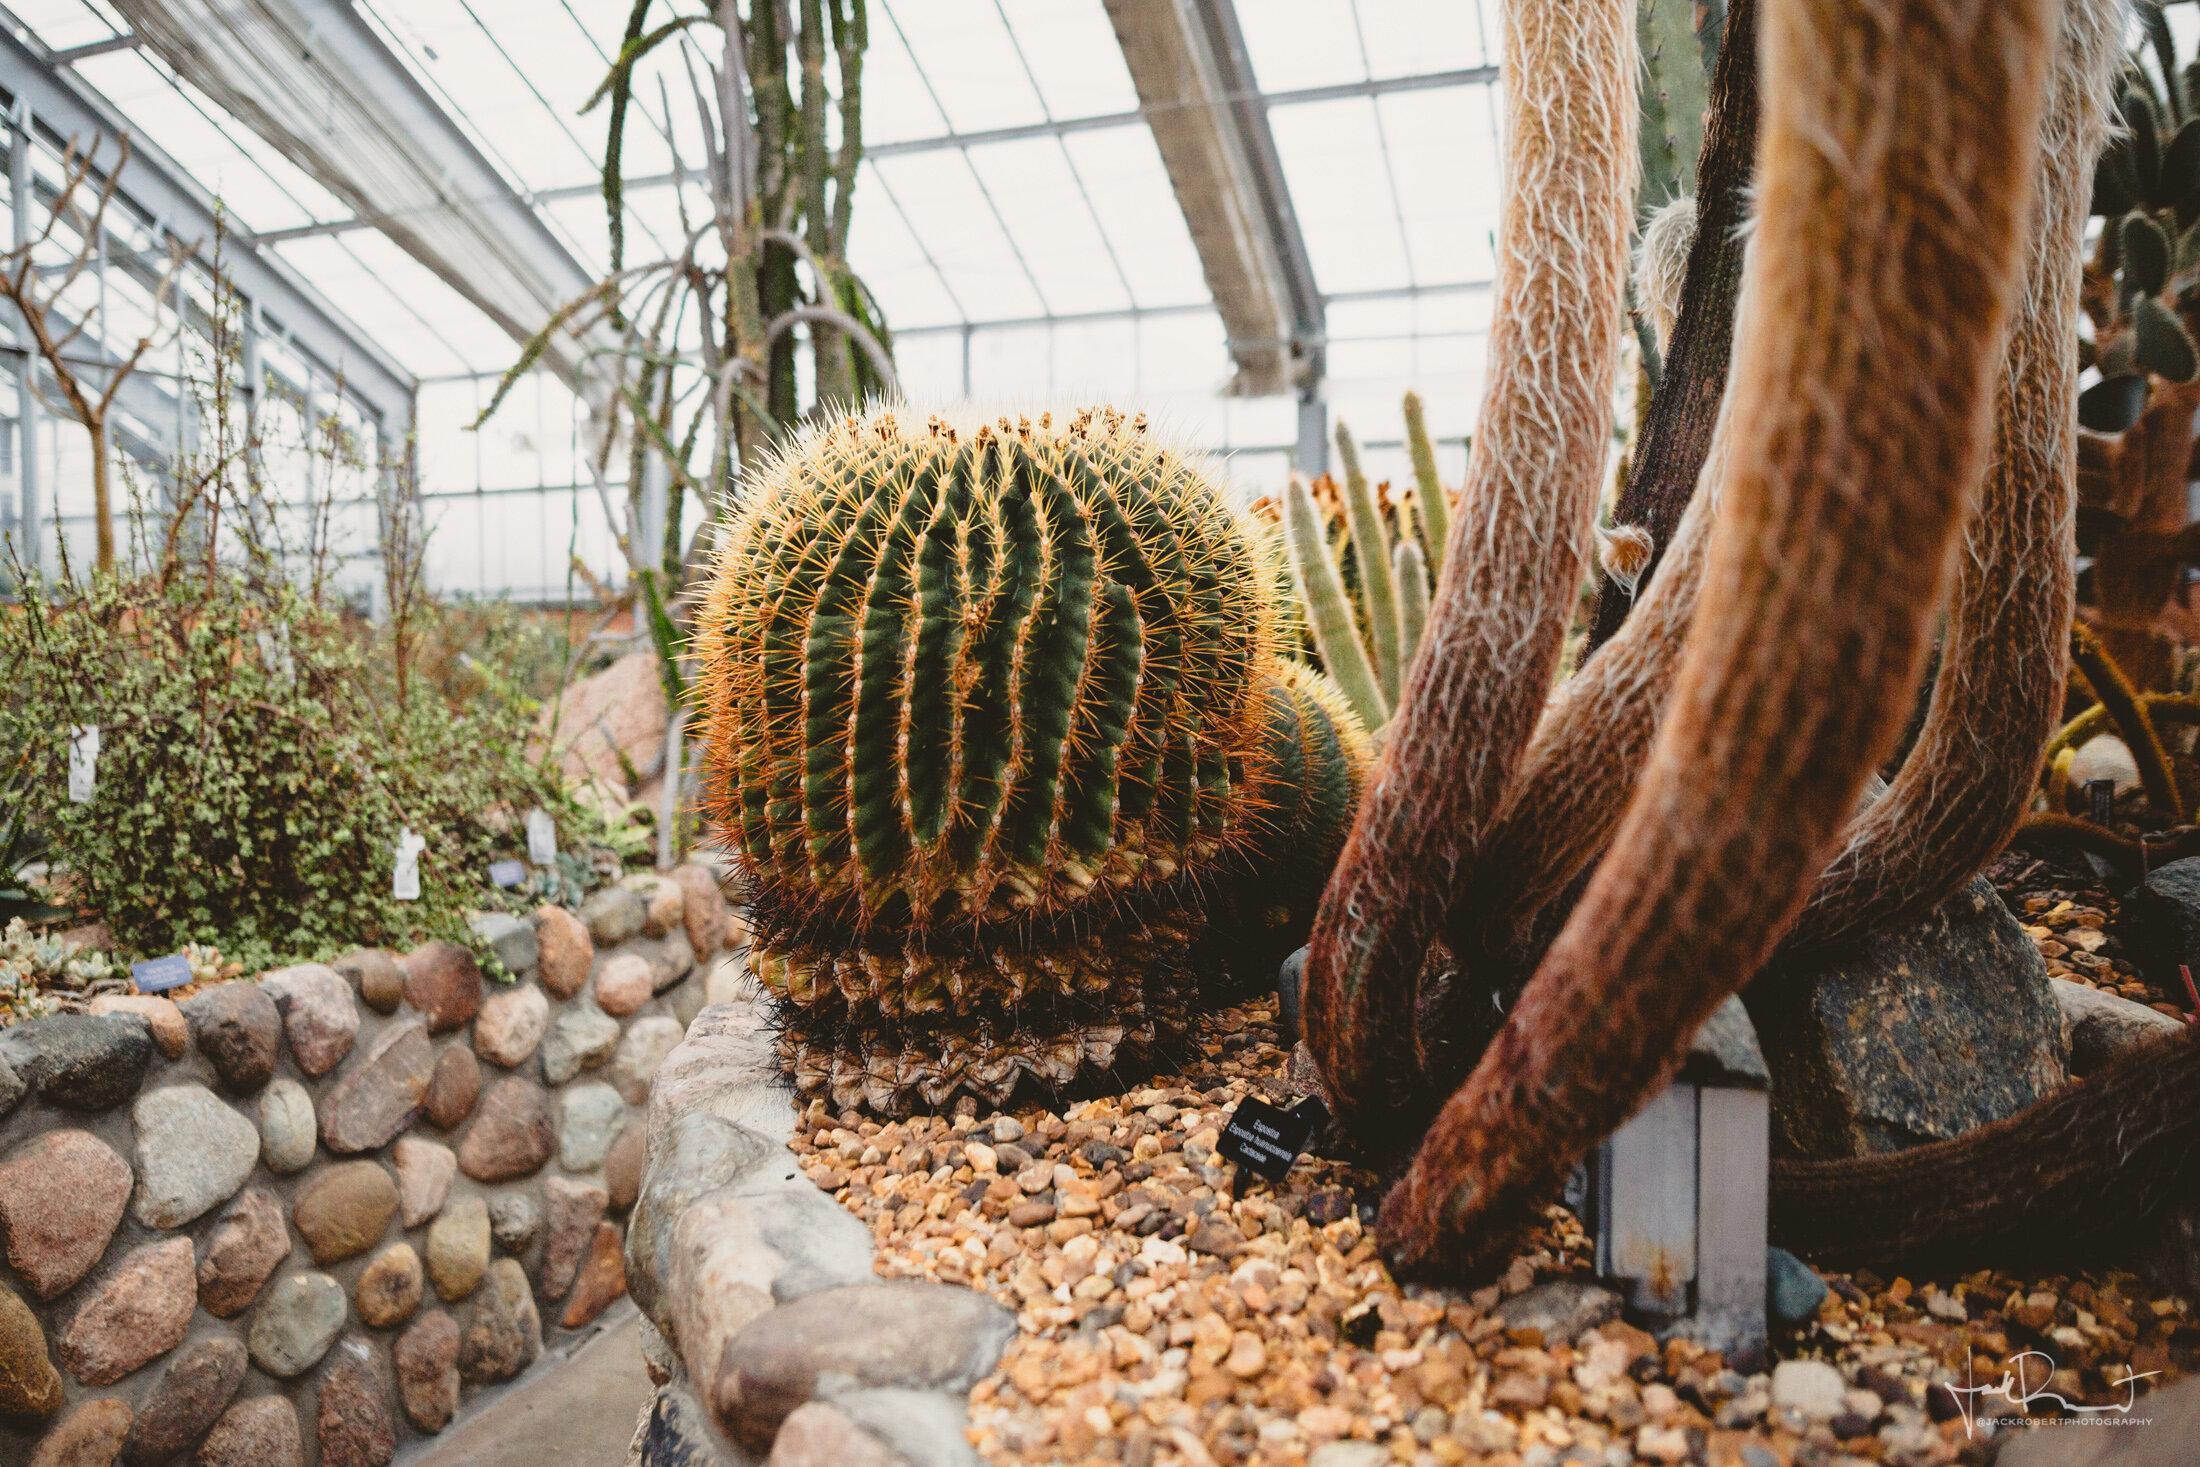 Greenhouse Conservatory Engagement Session - University of Michigan Matthaei Botanical Gardens - Jack Robert Photography